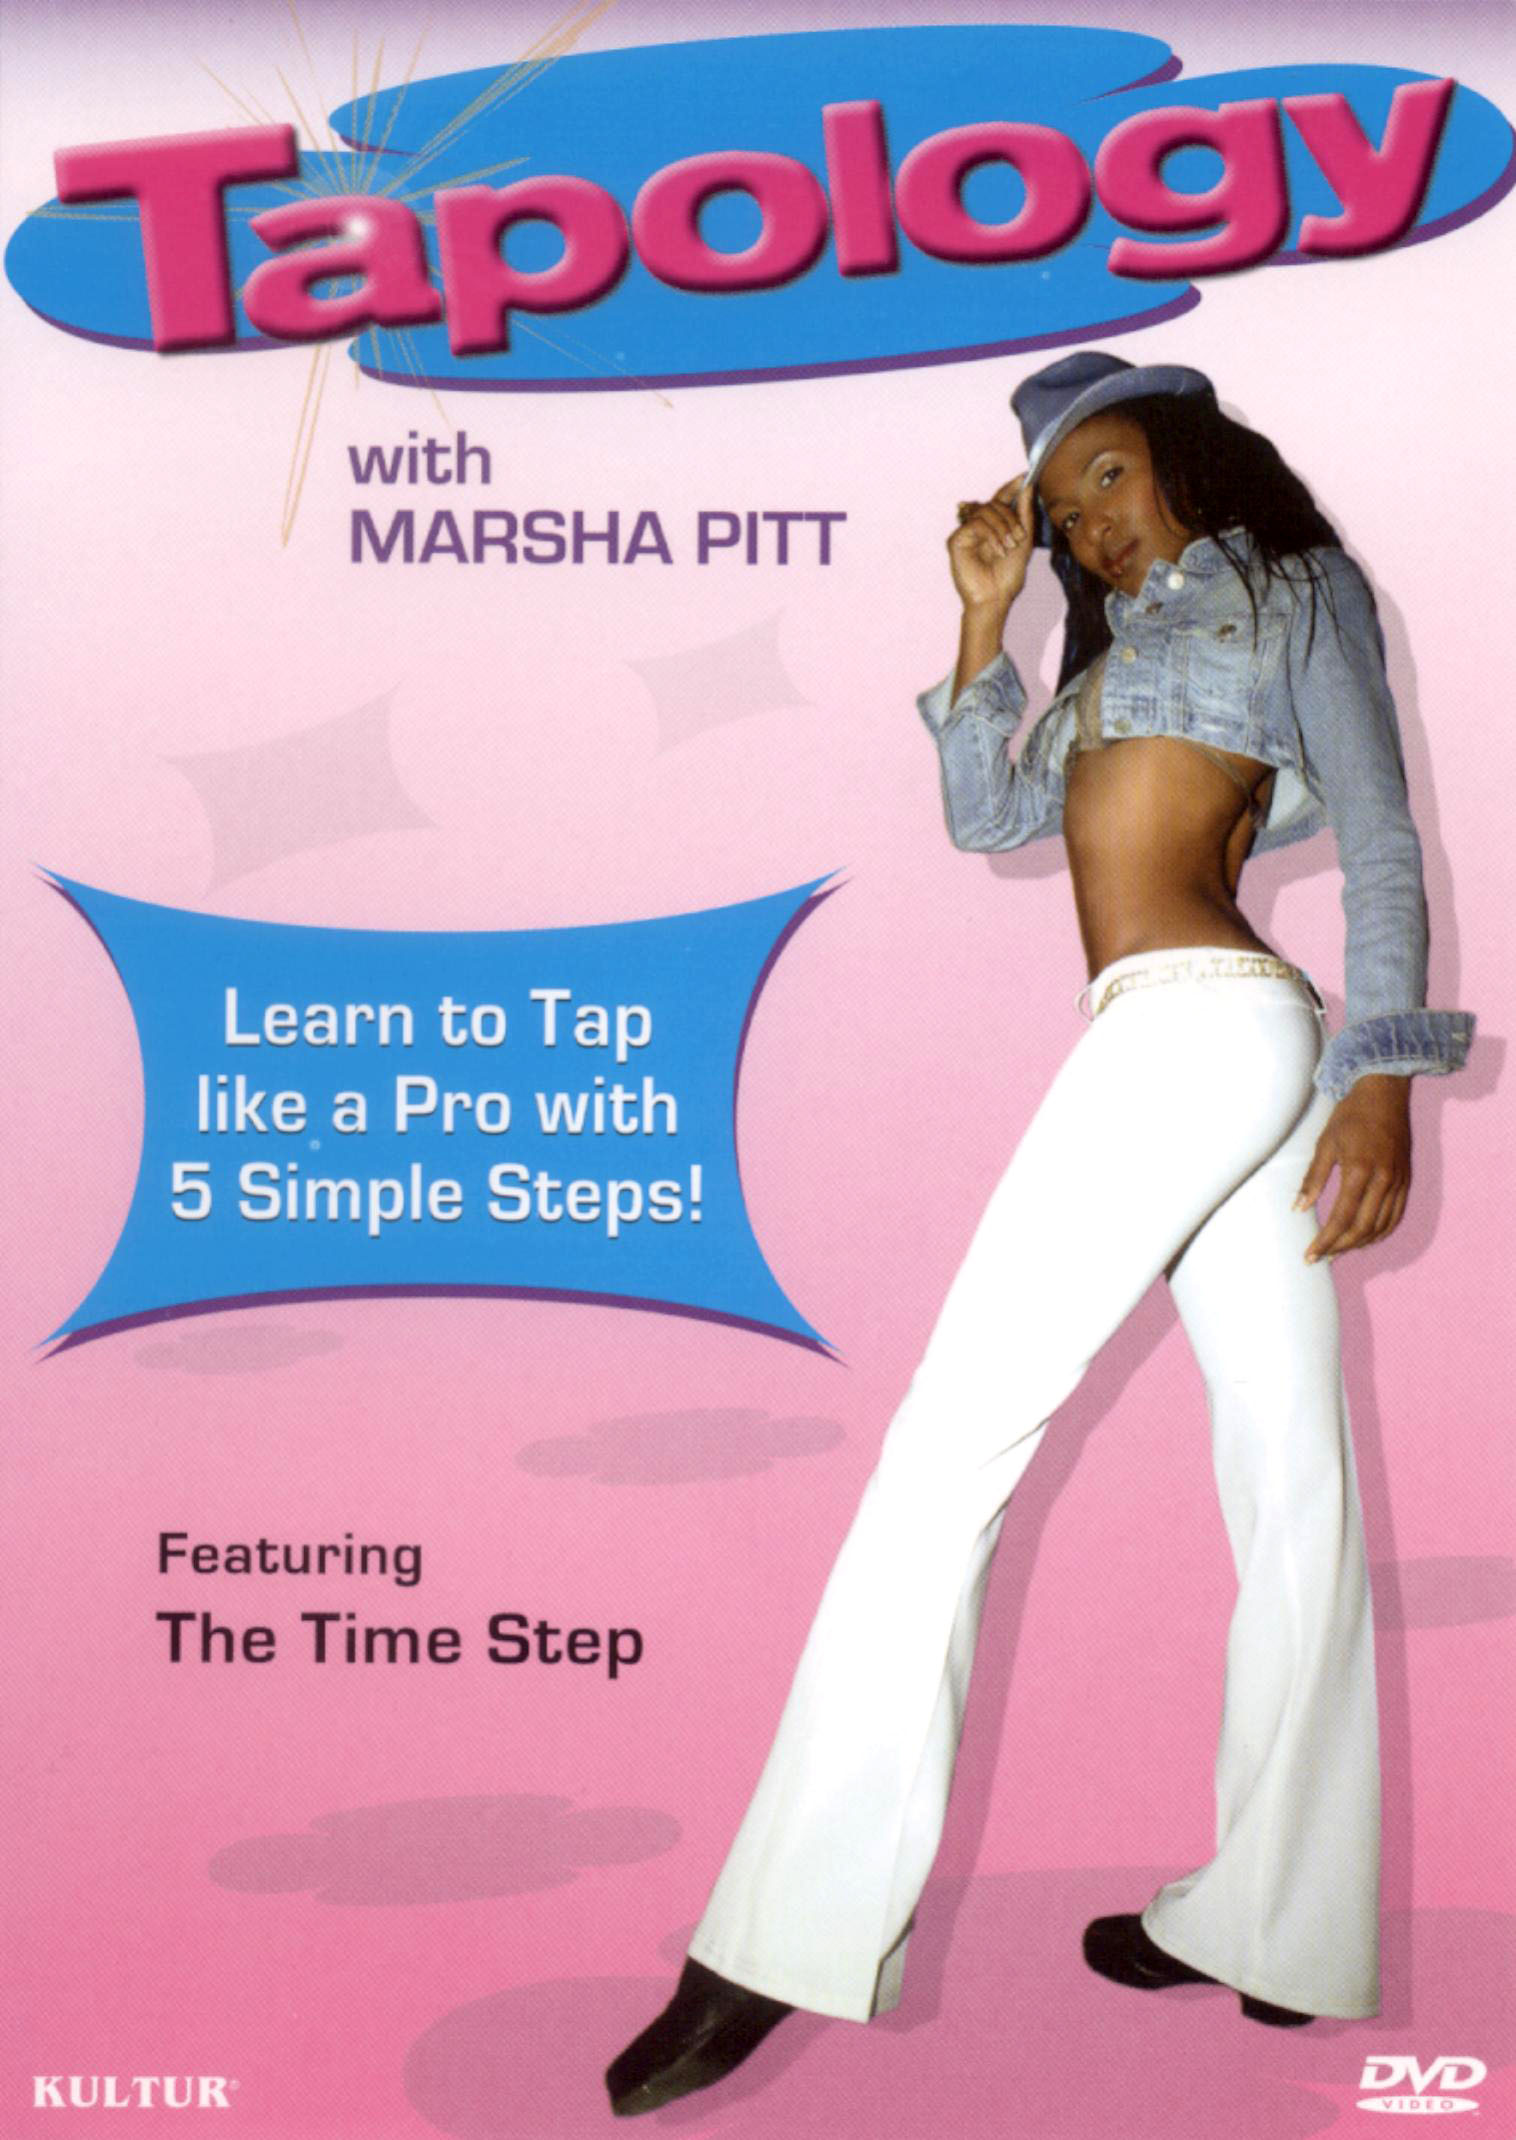 Tapology with Marsha Pitt